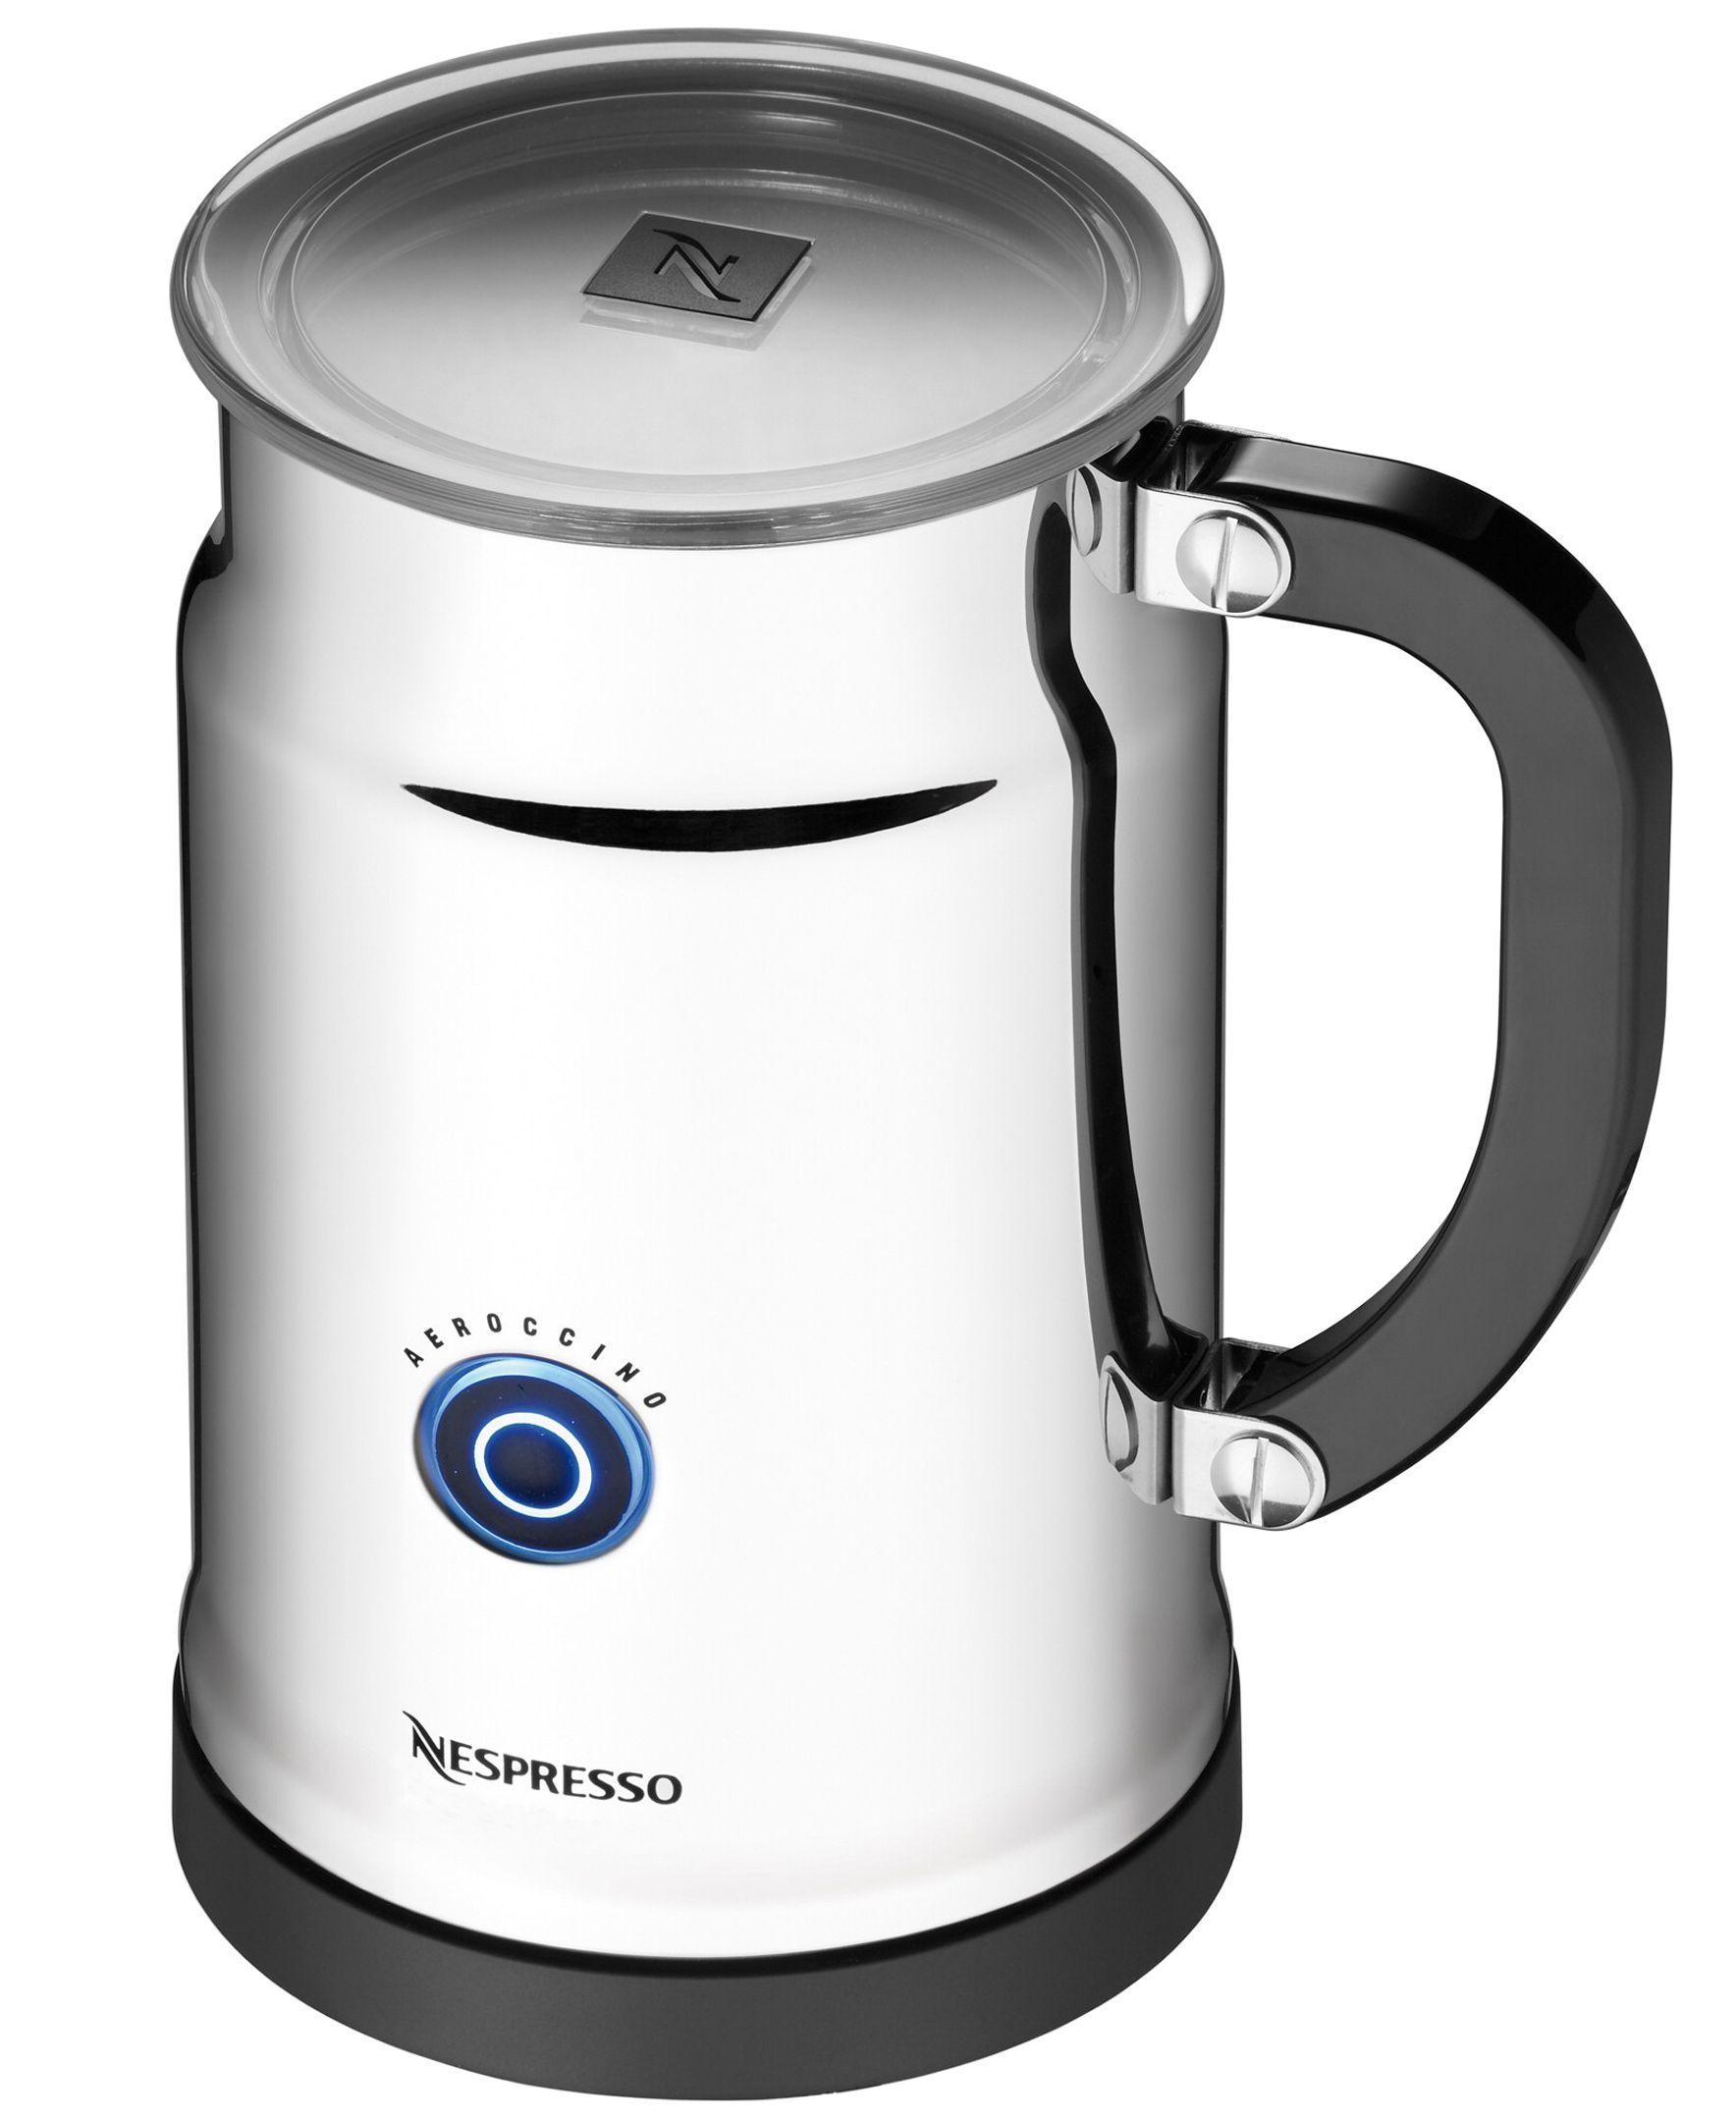 Nespresso 3192us Milk Frother, Aeroccino Plus Electric